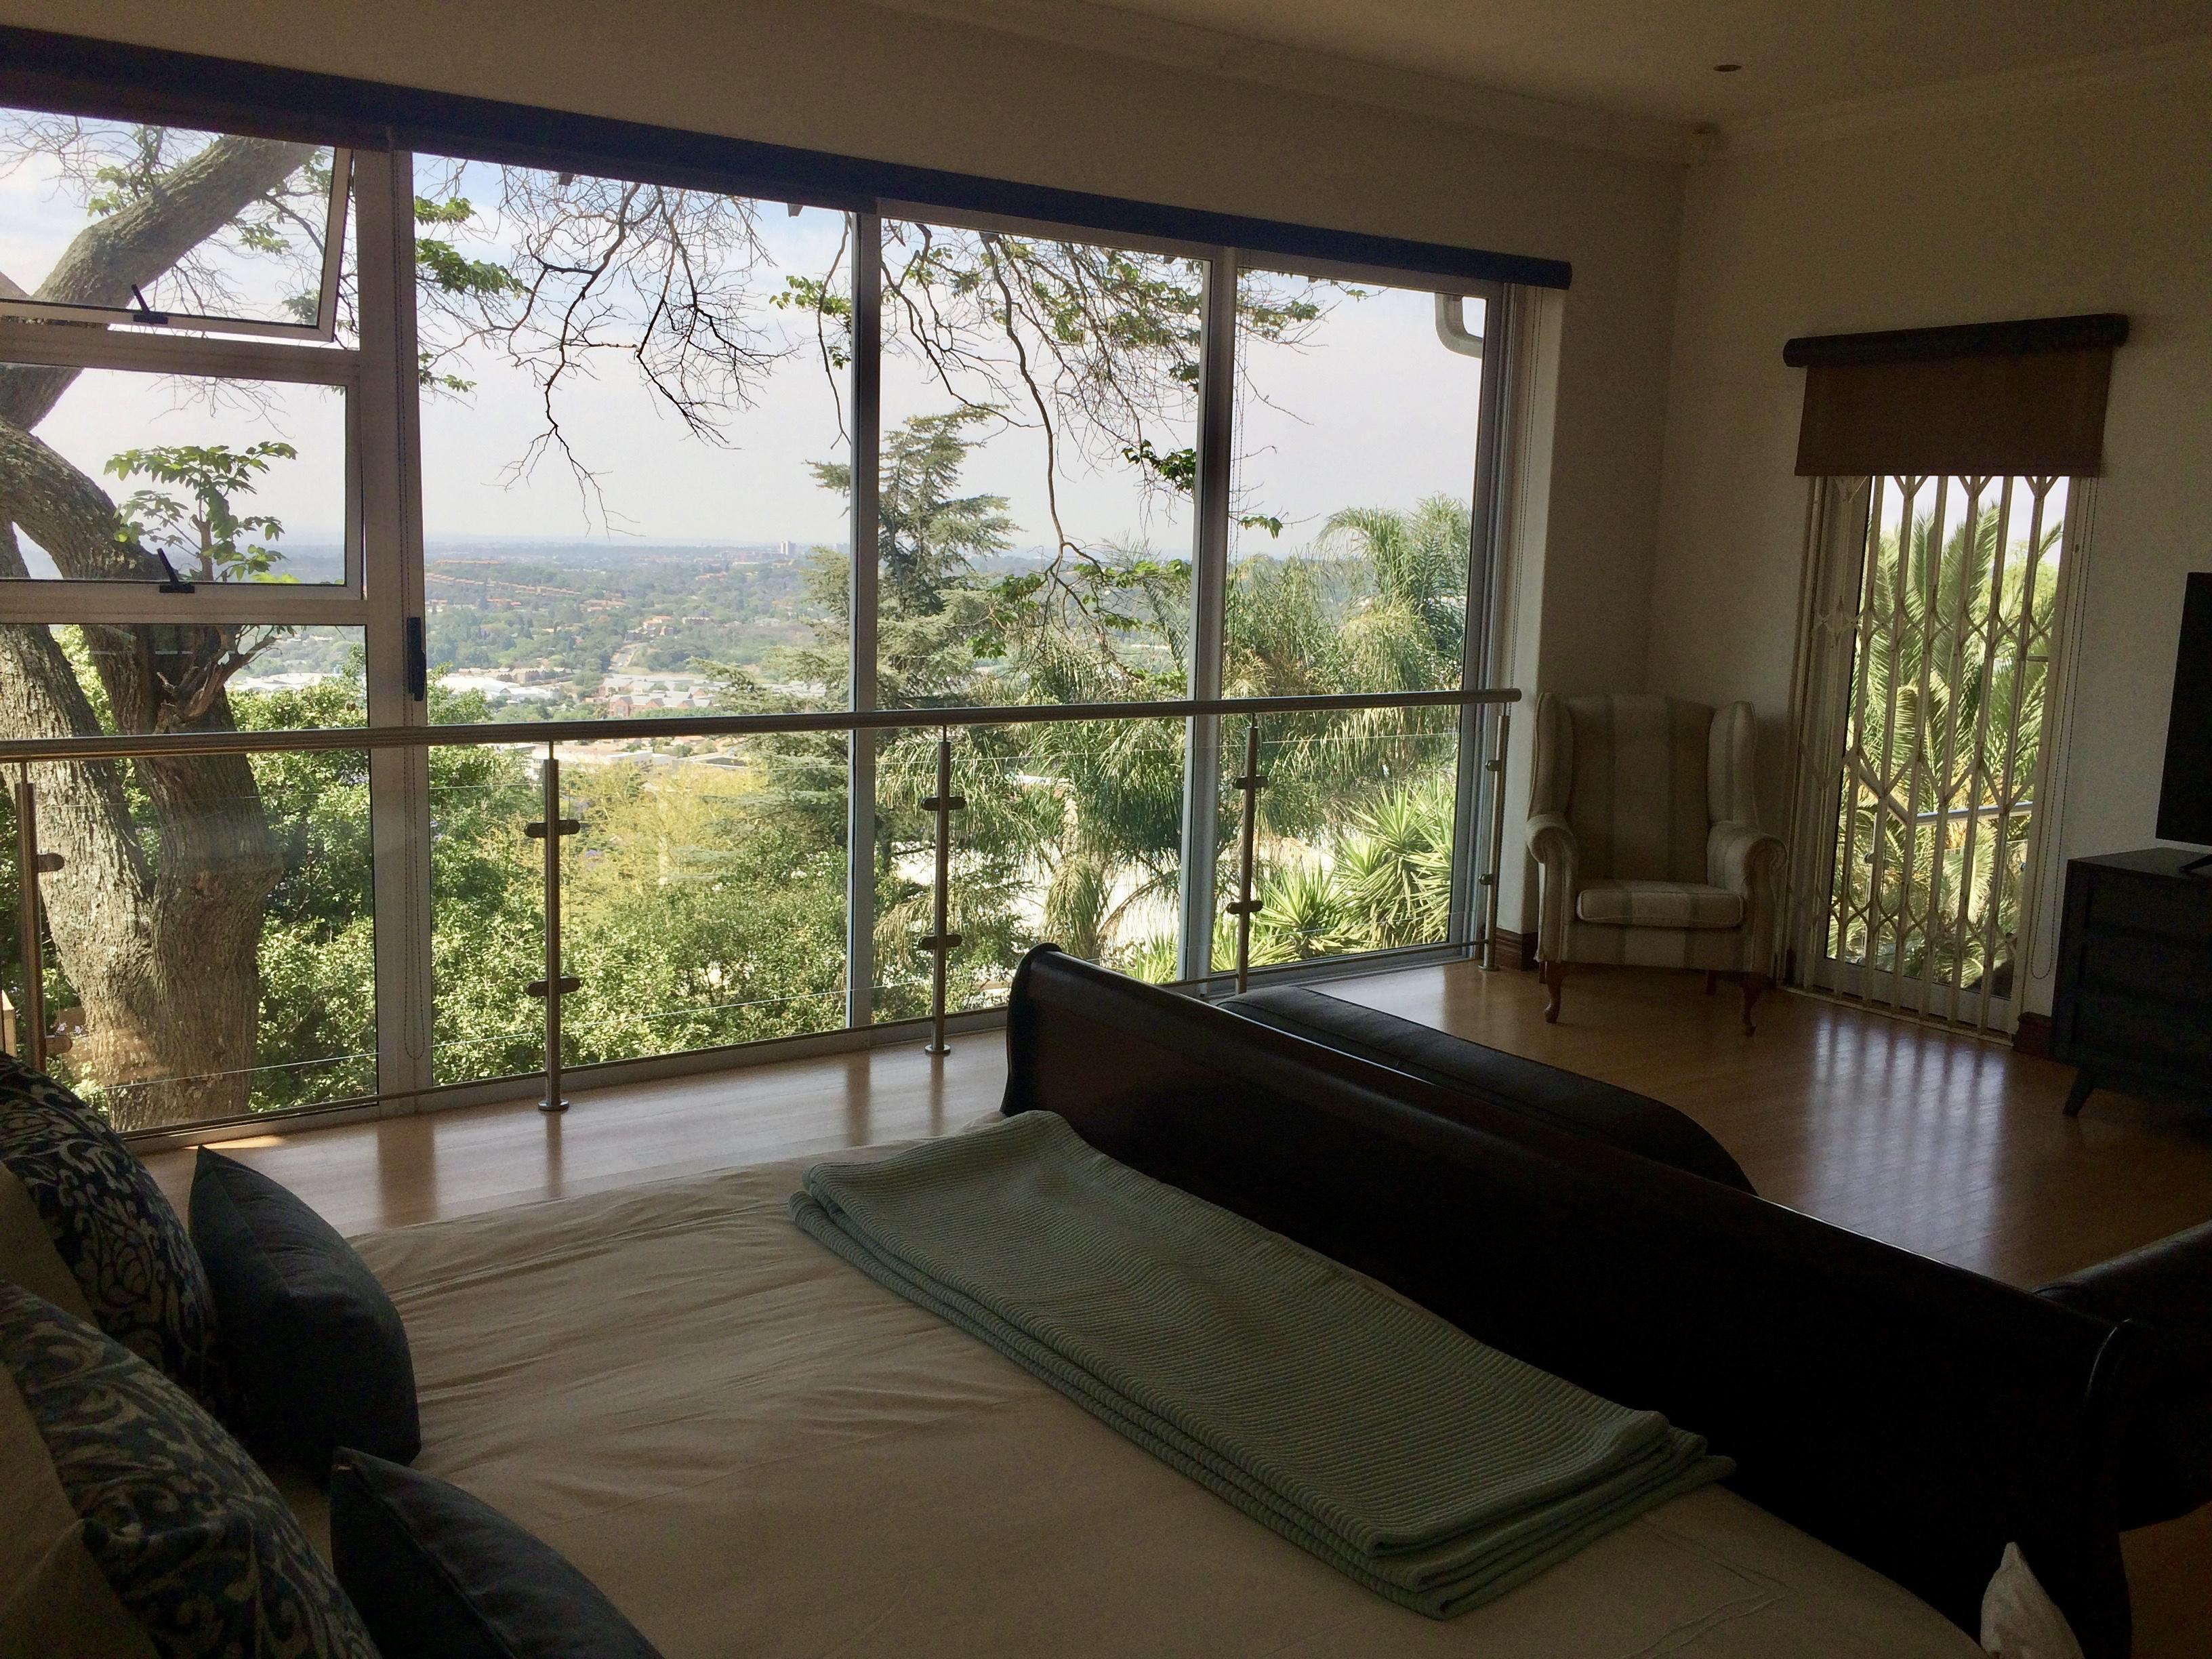 217A anderson, Northcliff, Gauteng, 4 Bedrooms Bedrooms, ,3 BathroomsBathrooms,House,For sale,anderson,1038